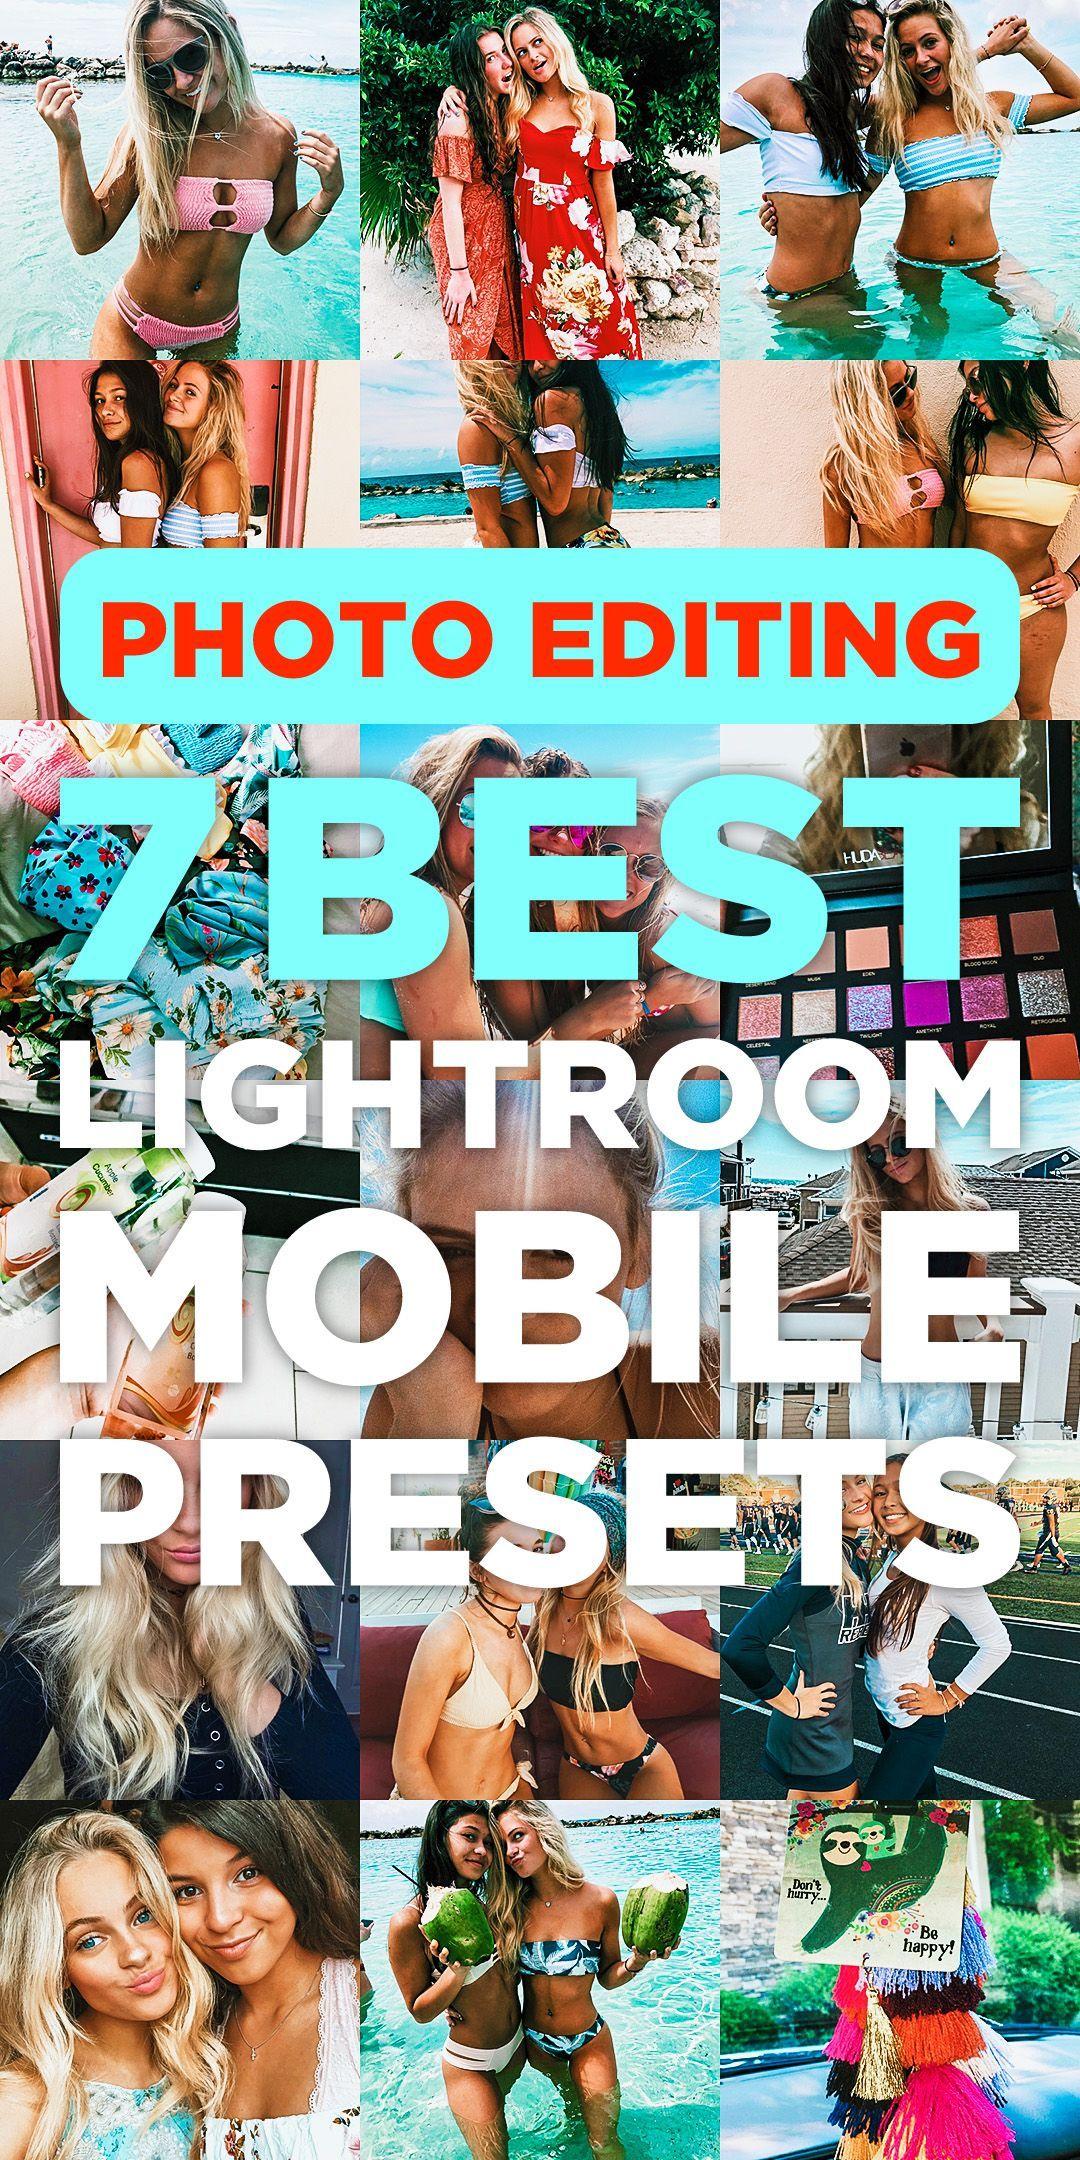 Filter App Nikon D3400 Cheat Sheet Selfie Hashtags Instagram Best Vsco Filter Best Photo Editing Software Lightroom Lightroom Presets For Portraits